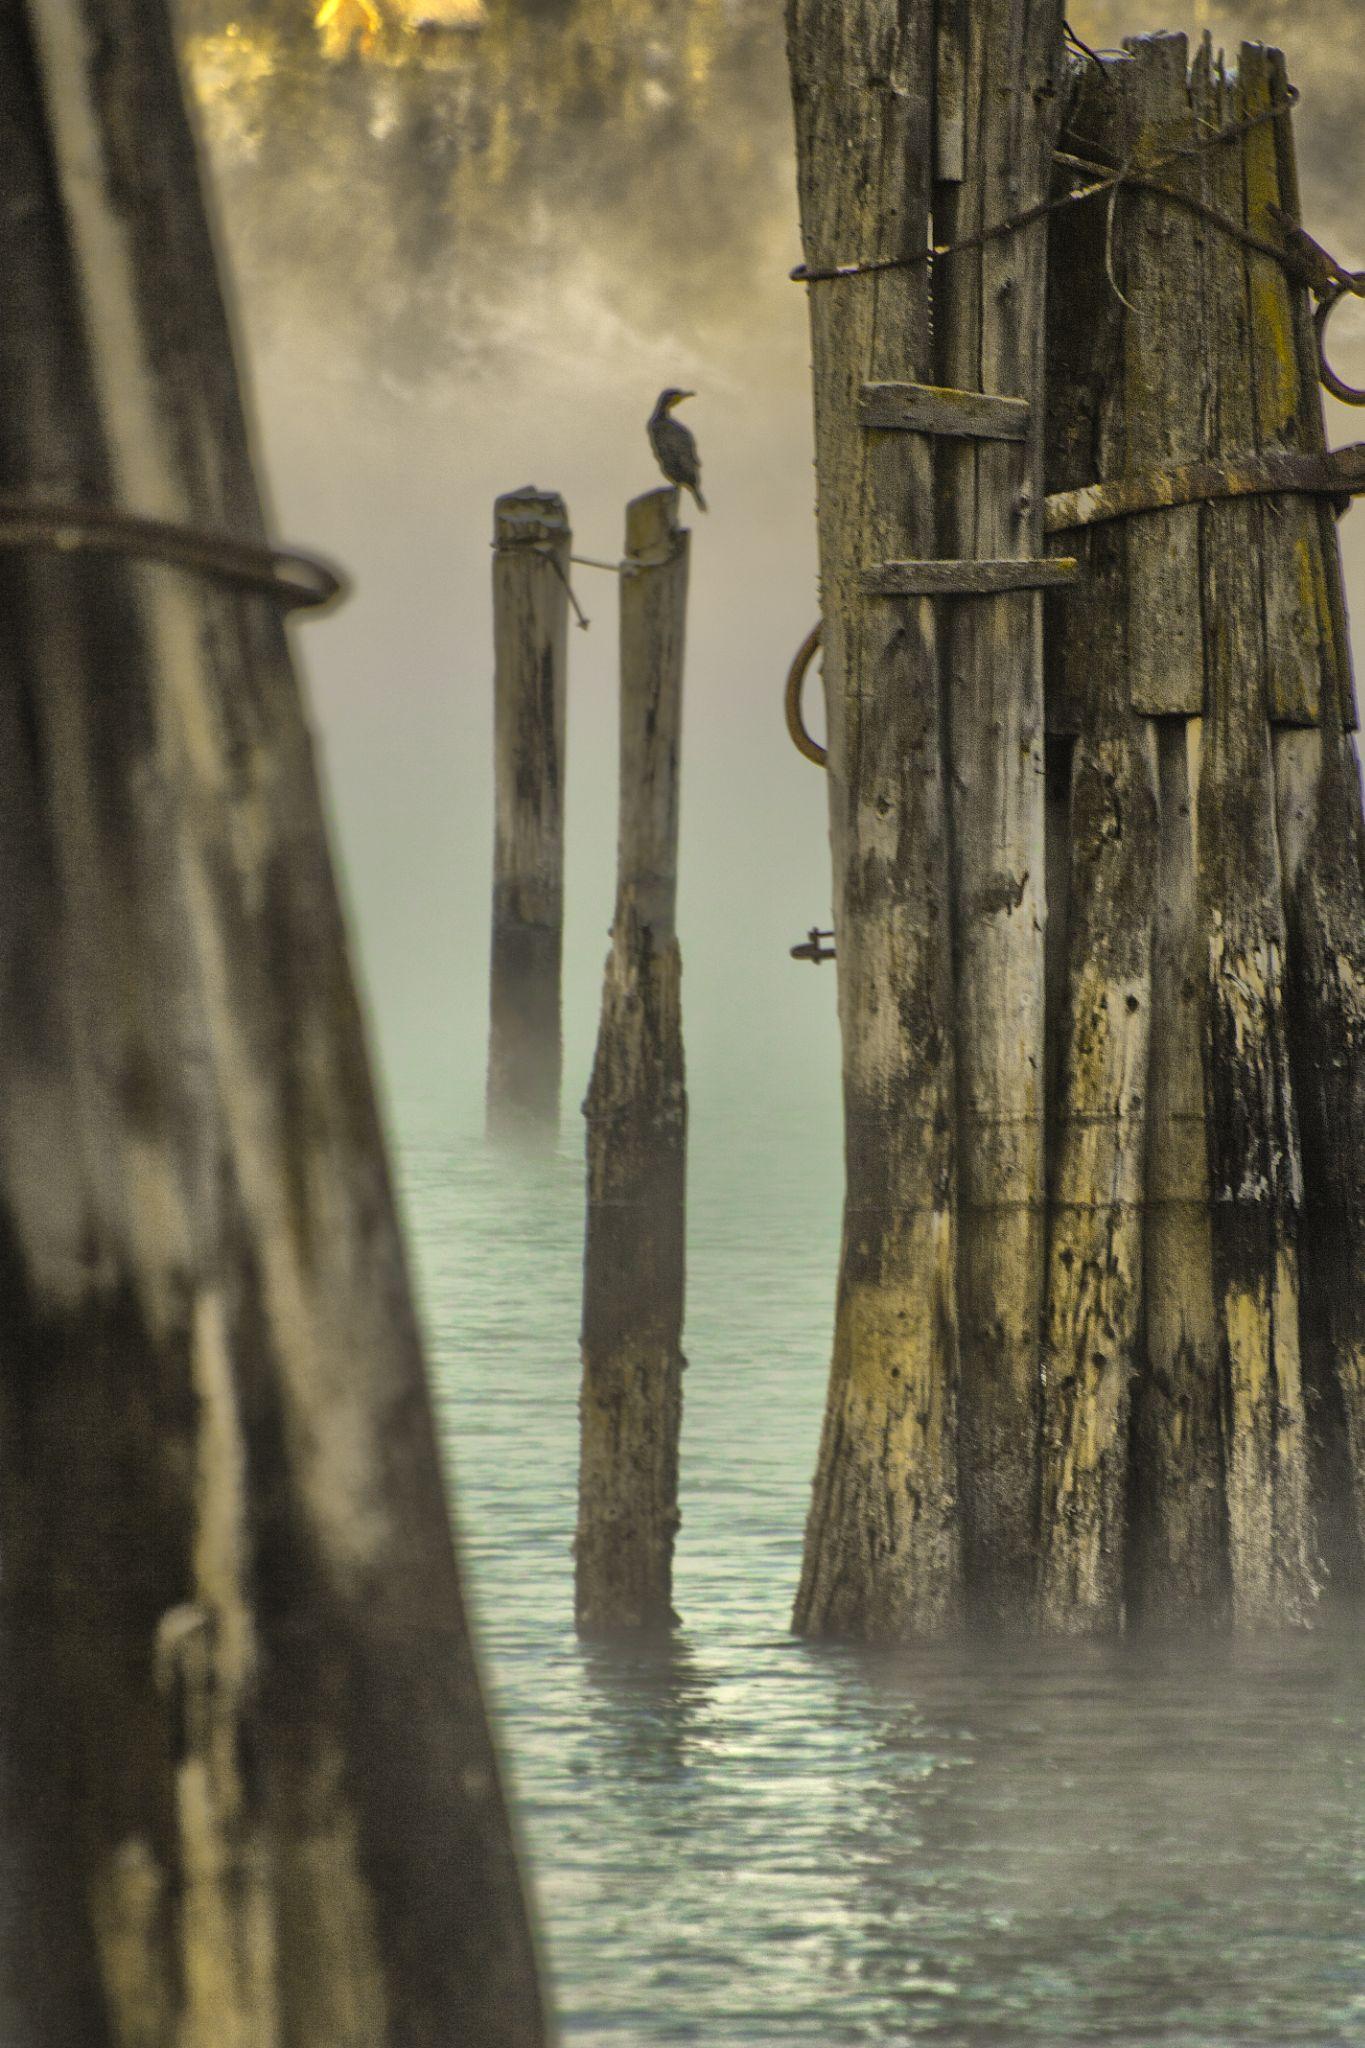 Cormorant Hommelvik shoreline by Odd Rune Wang